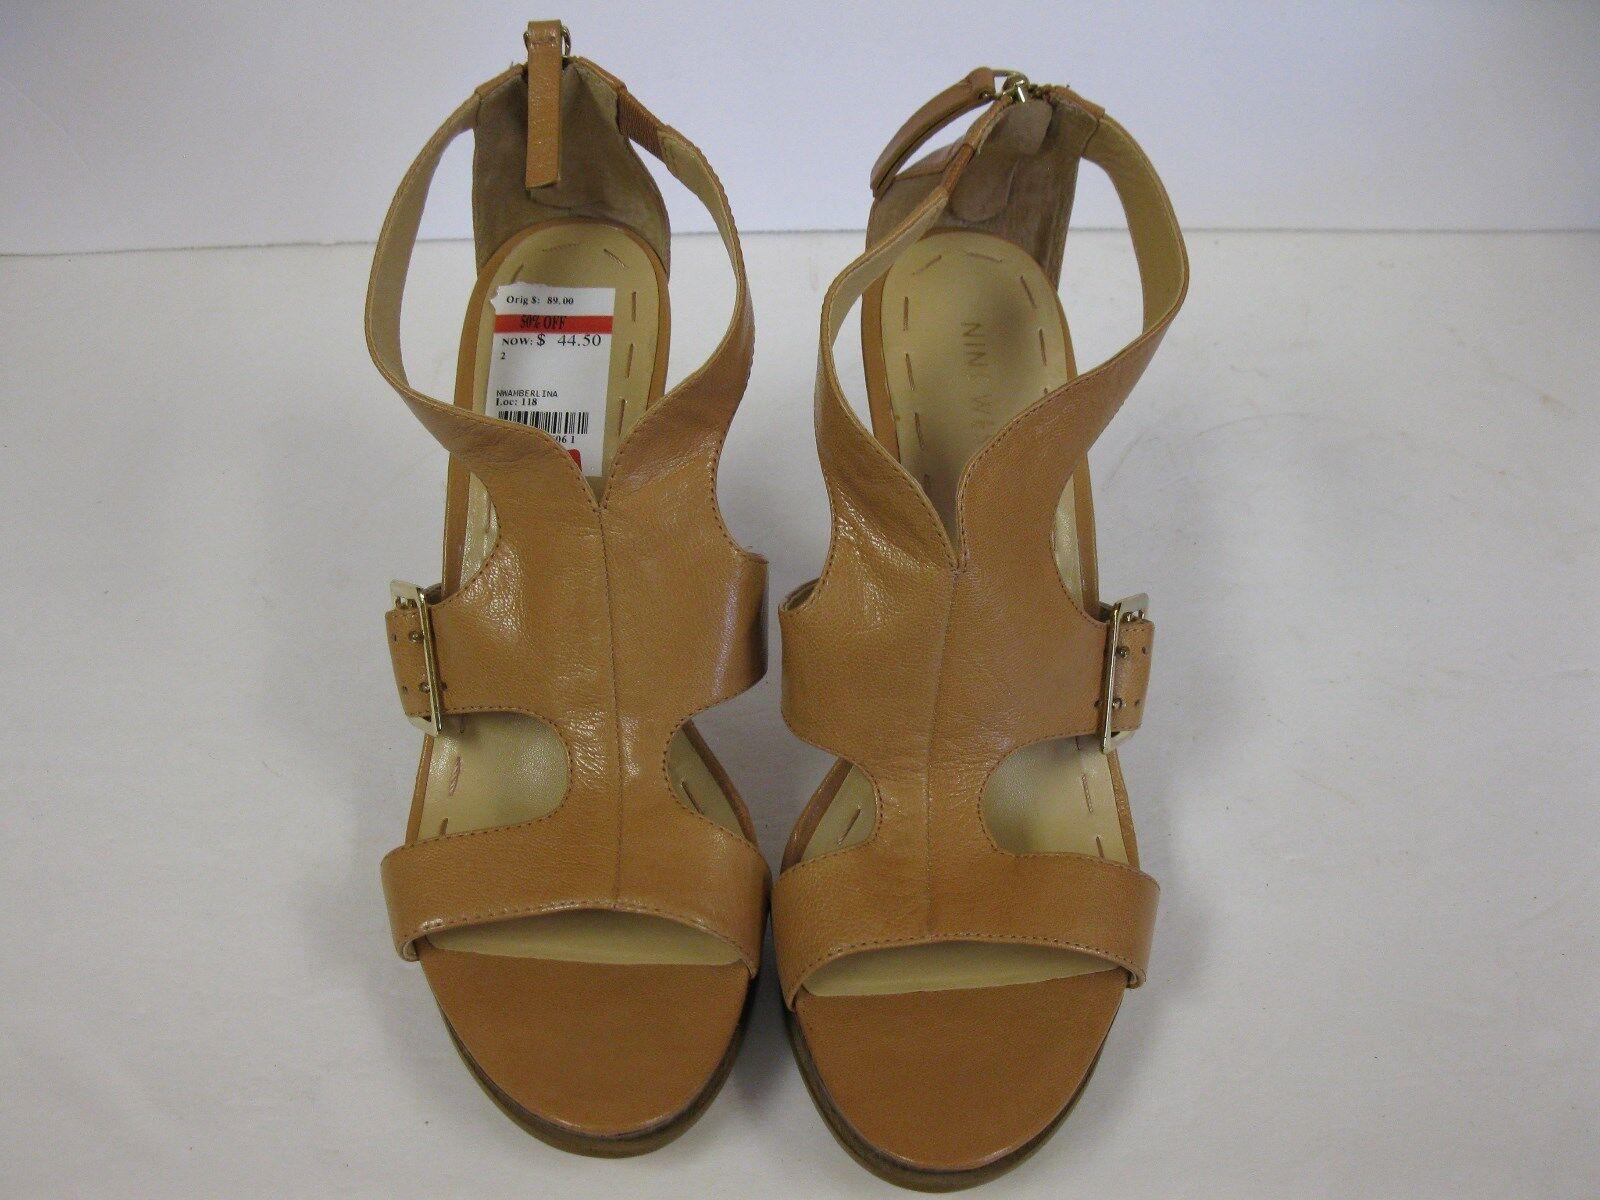 NINE Open WEST Amberlina Beige Leder Platform Heels Open NINE Toe Damenschuhe Schuhes 9.5M d76285